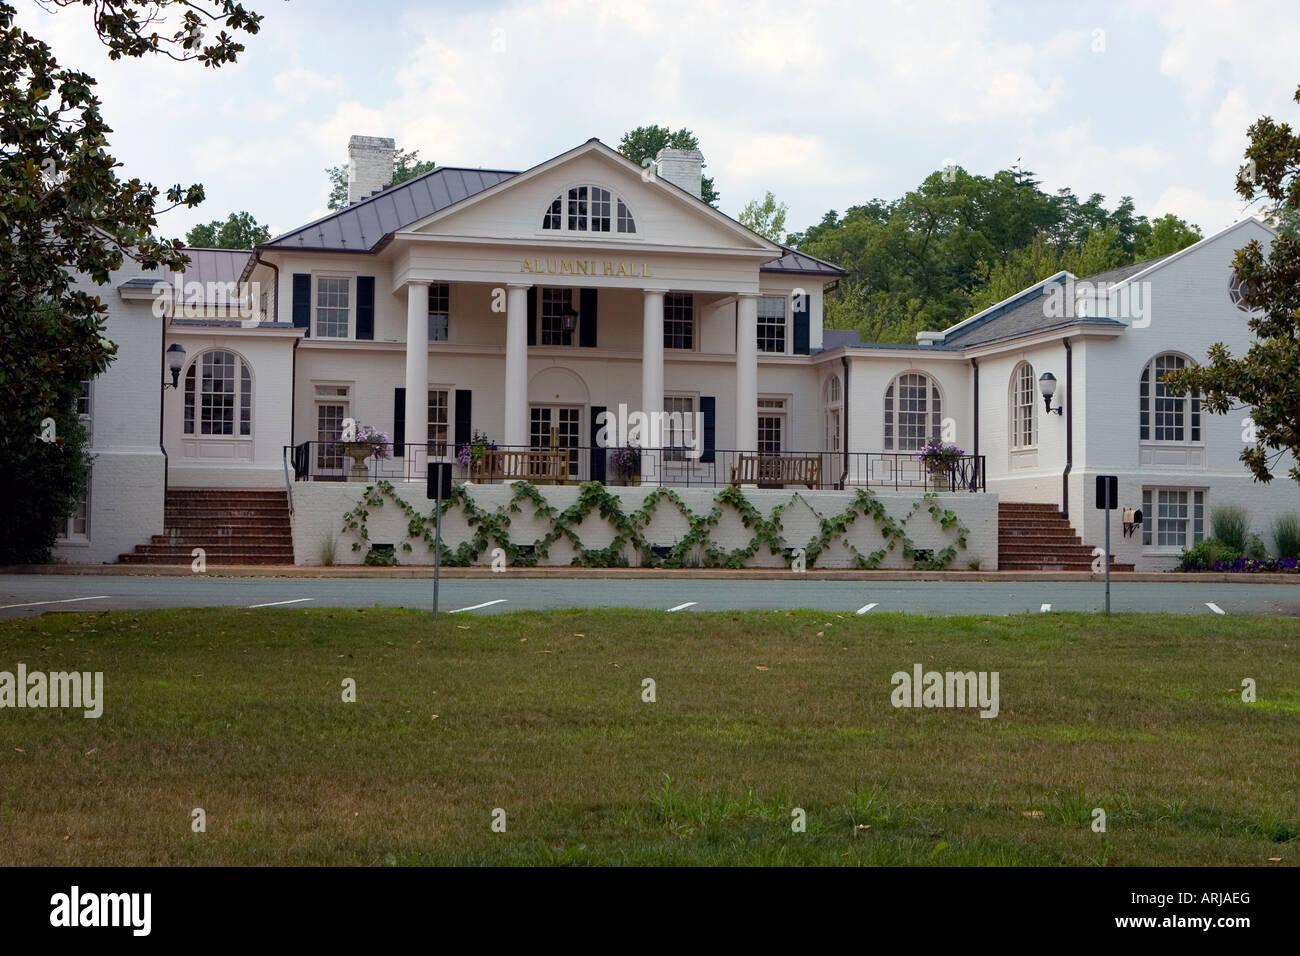 The University of Virginia's Alumni Hall located off of Emmett Street US 29 Business in Charlottesville VA - Stock Image